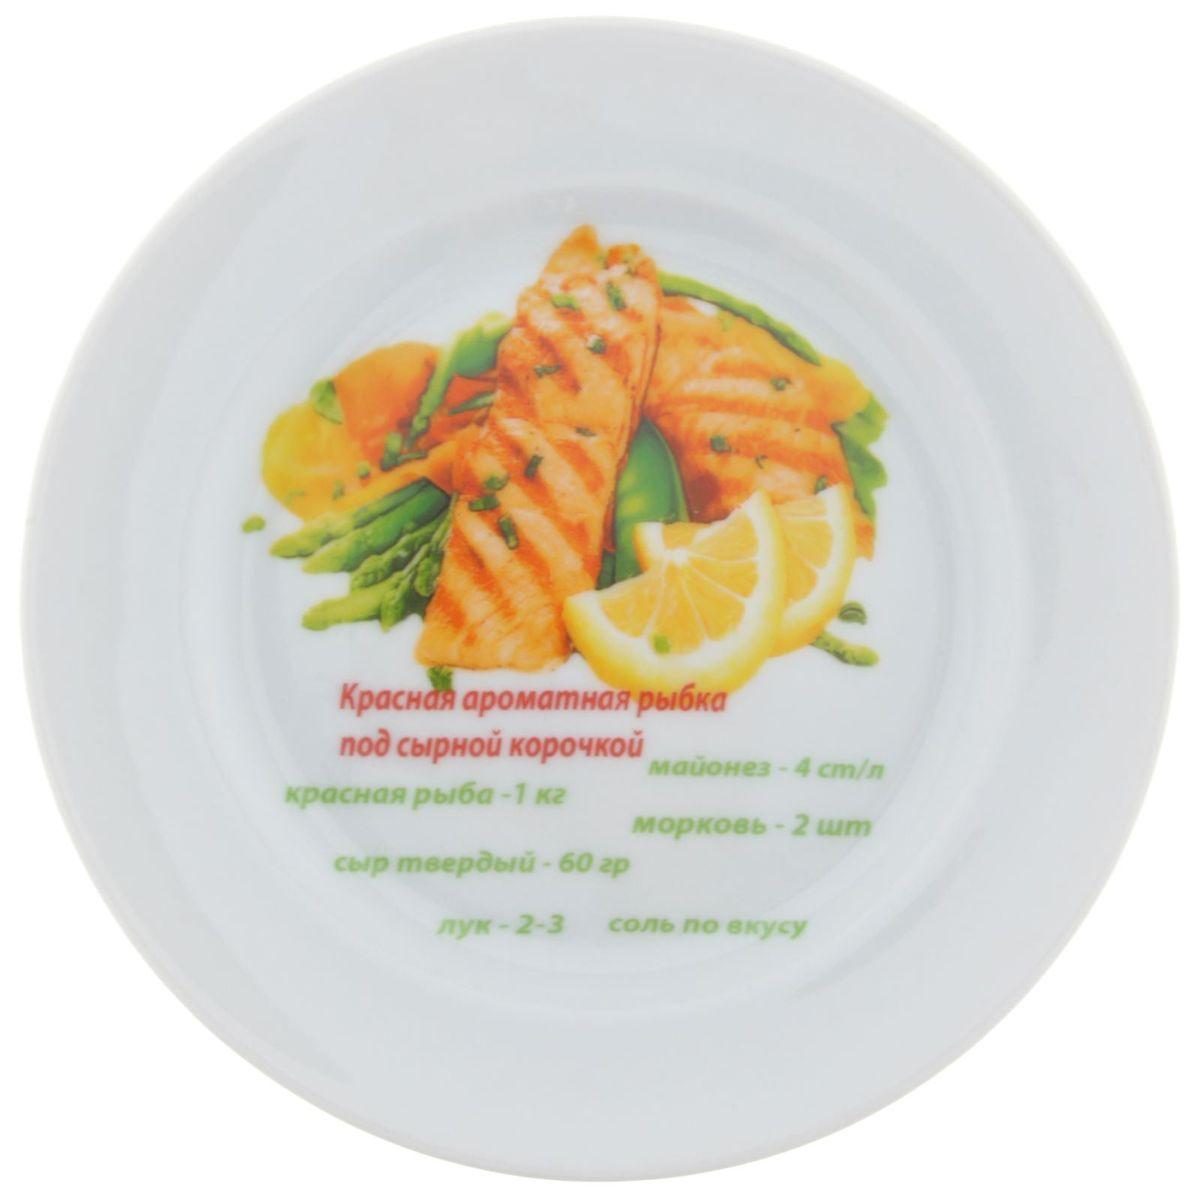 Тарелка мелкая Идиллия. Рецепты, диаметр 17 см1303796